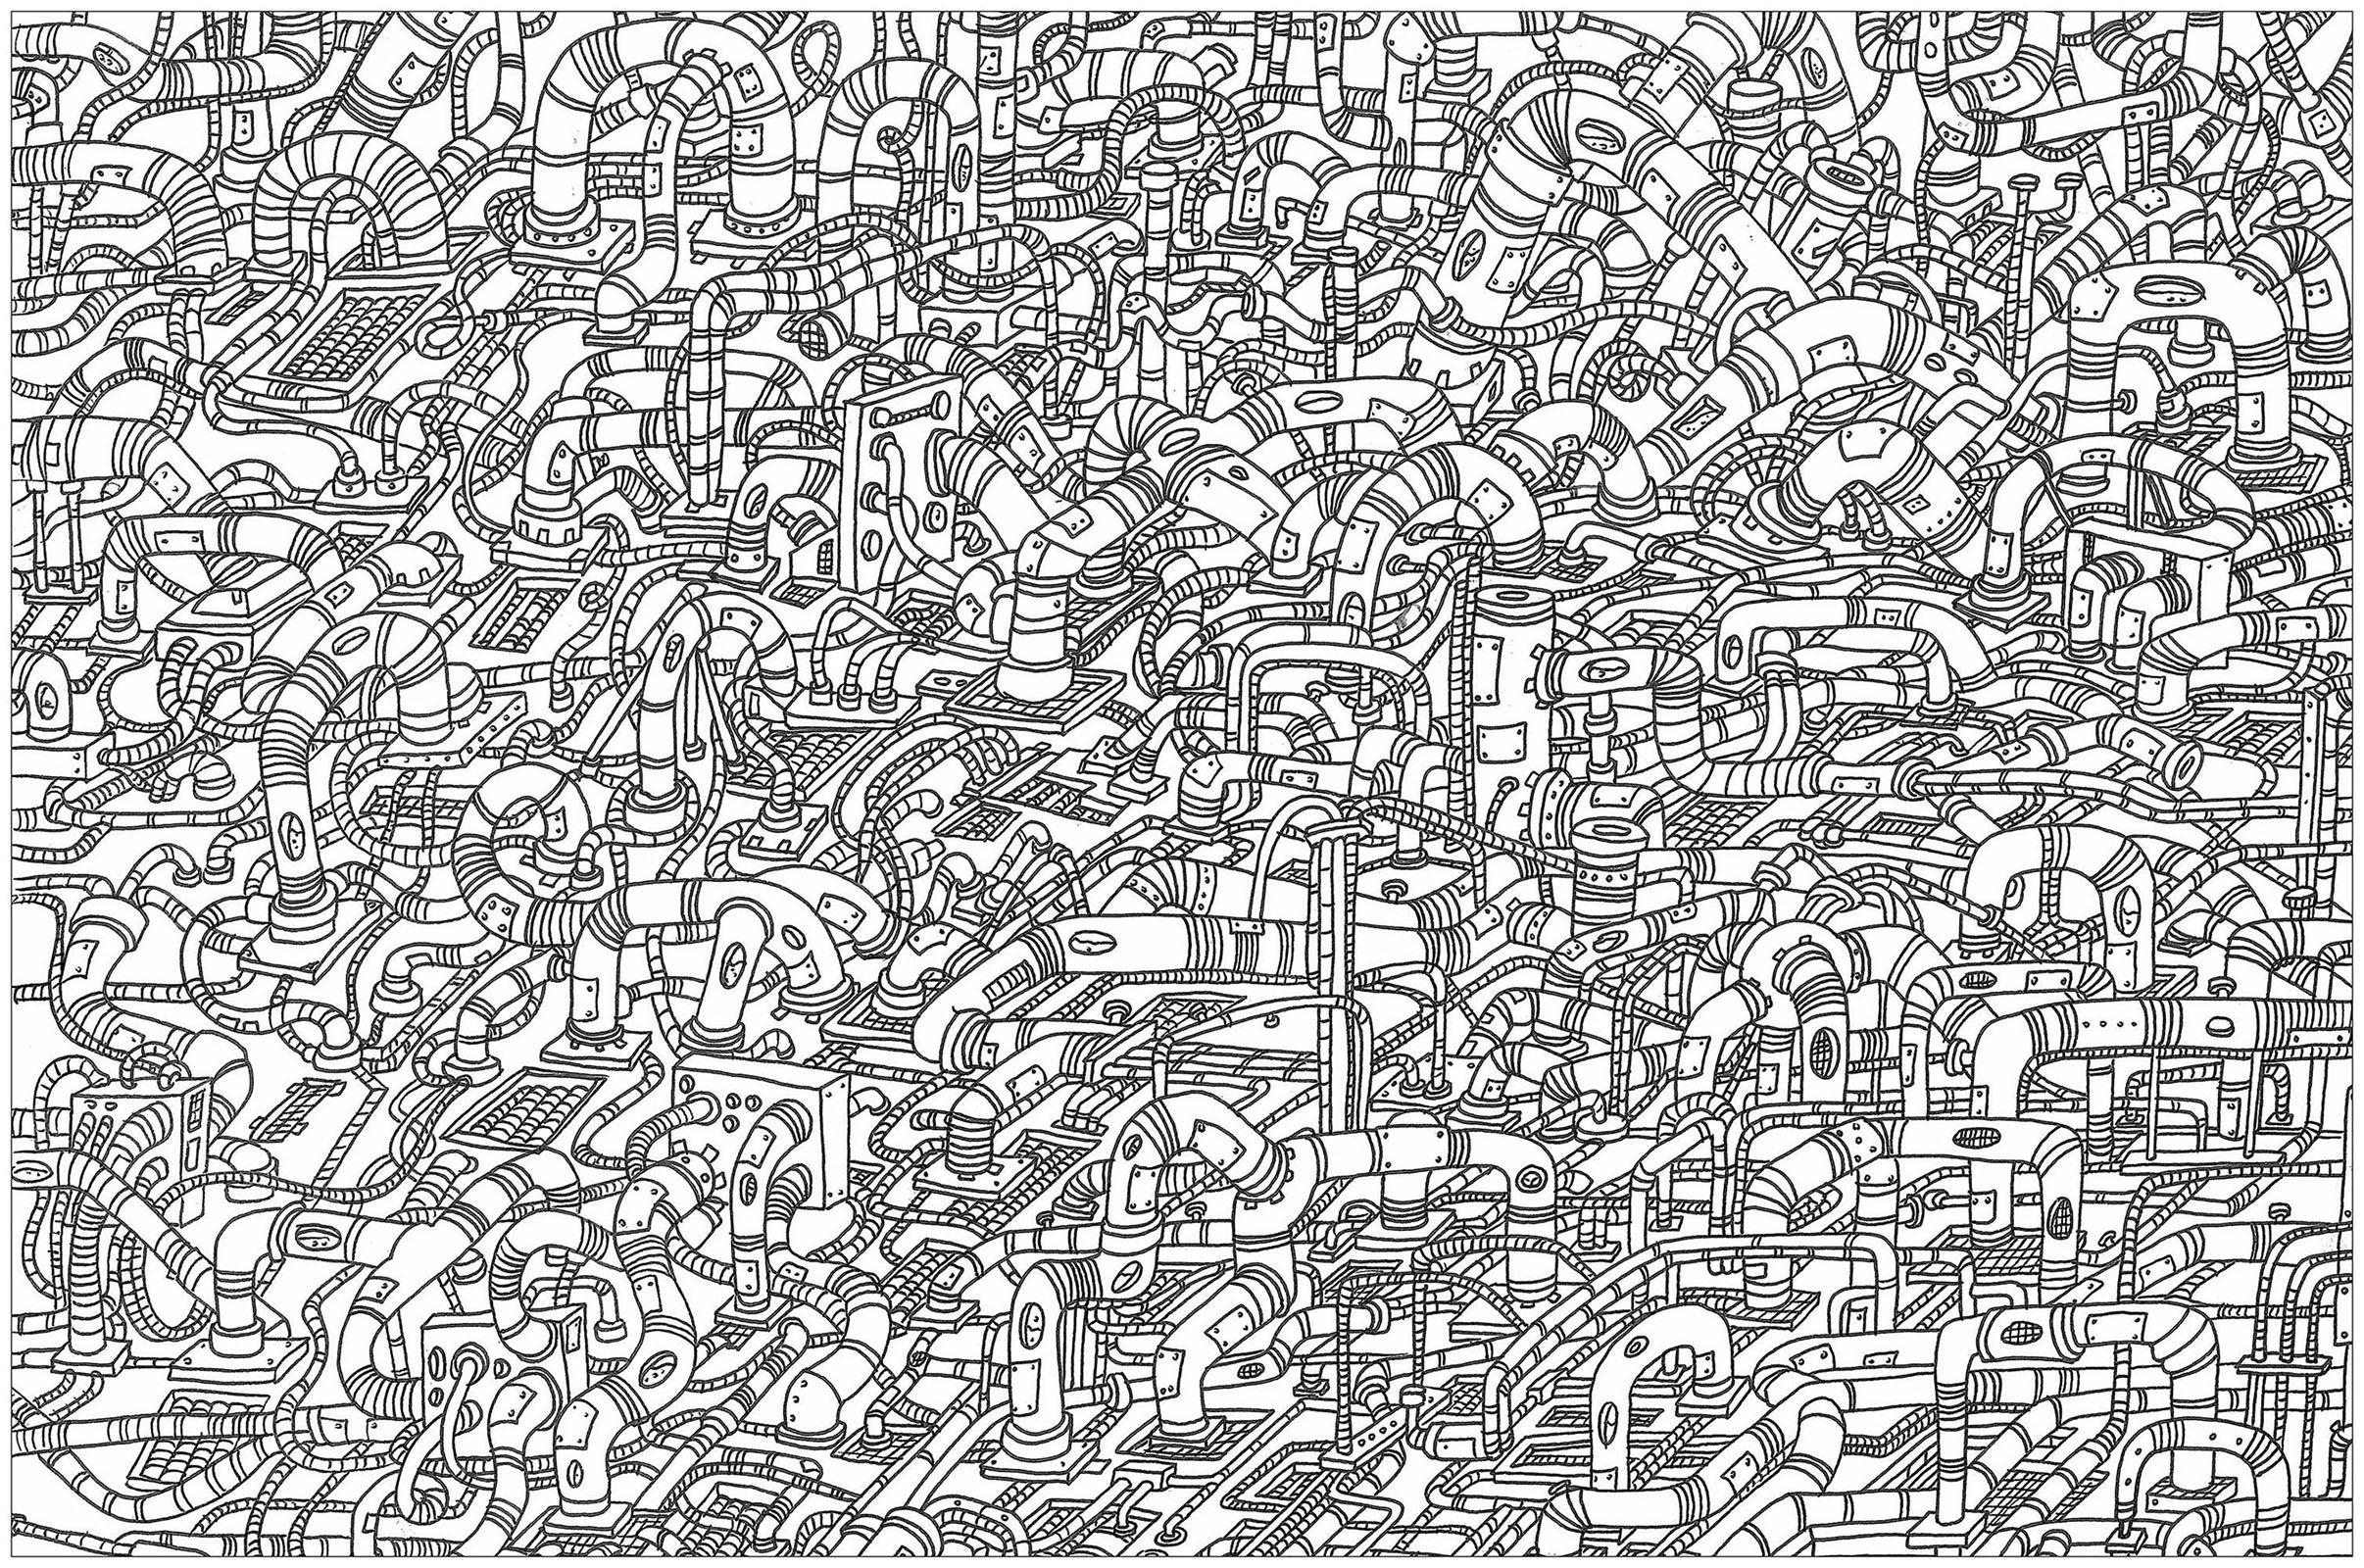 wheres waldo coloring pages - photo#17